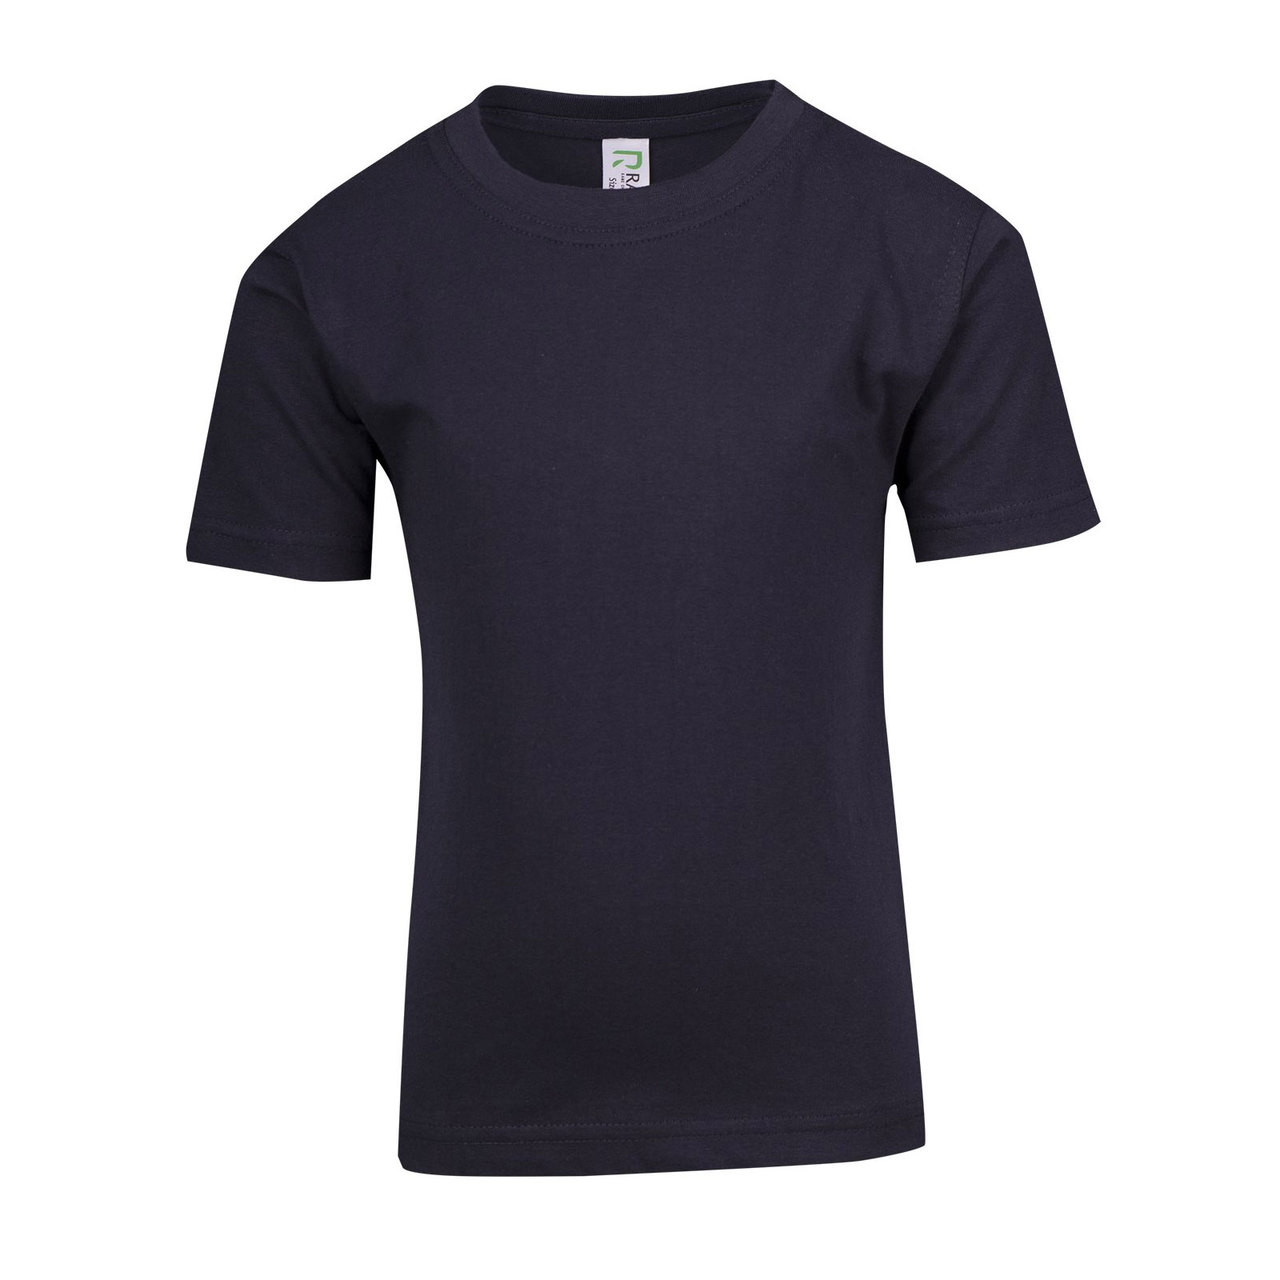 808789ce9 ALEX | kids/baby t-shirts | plain regular | Plain T Shirts ...